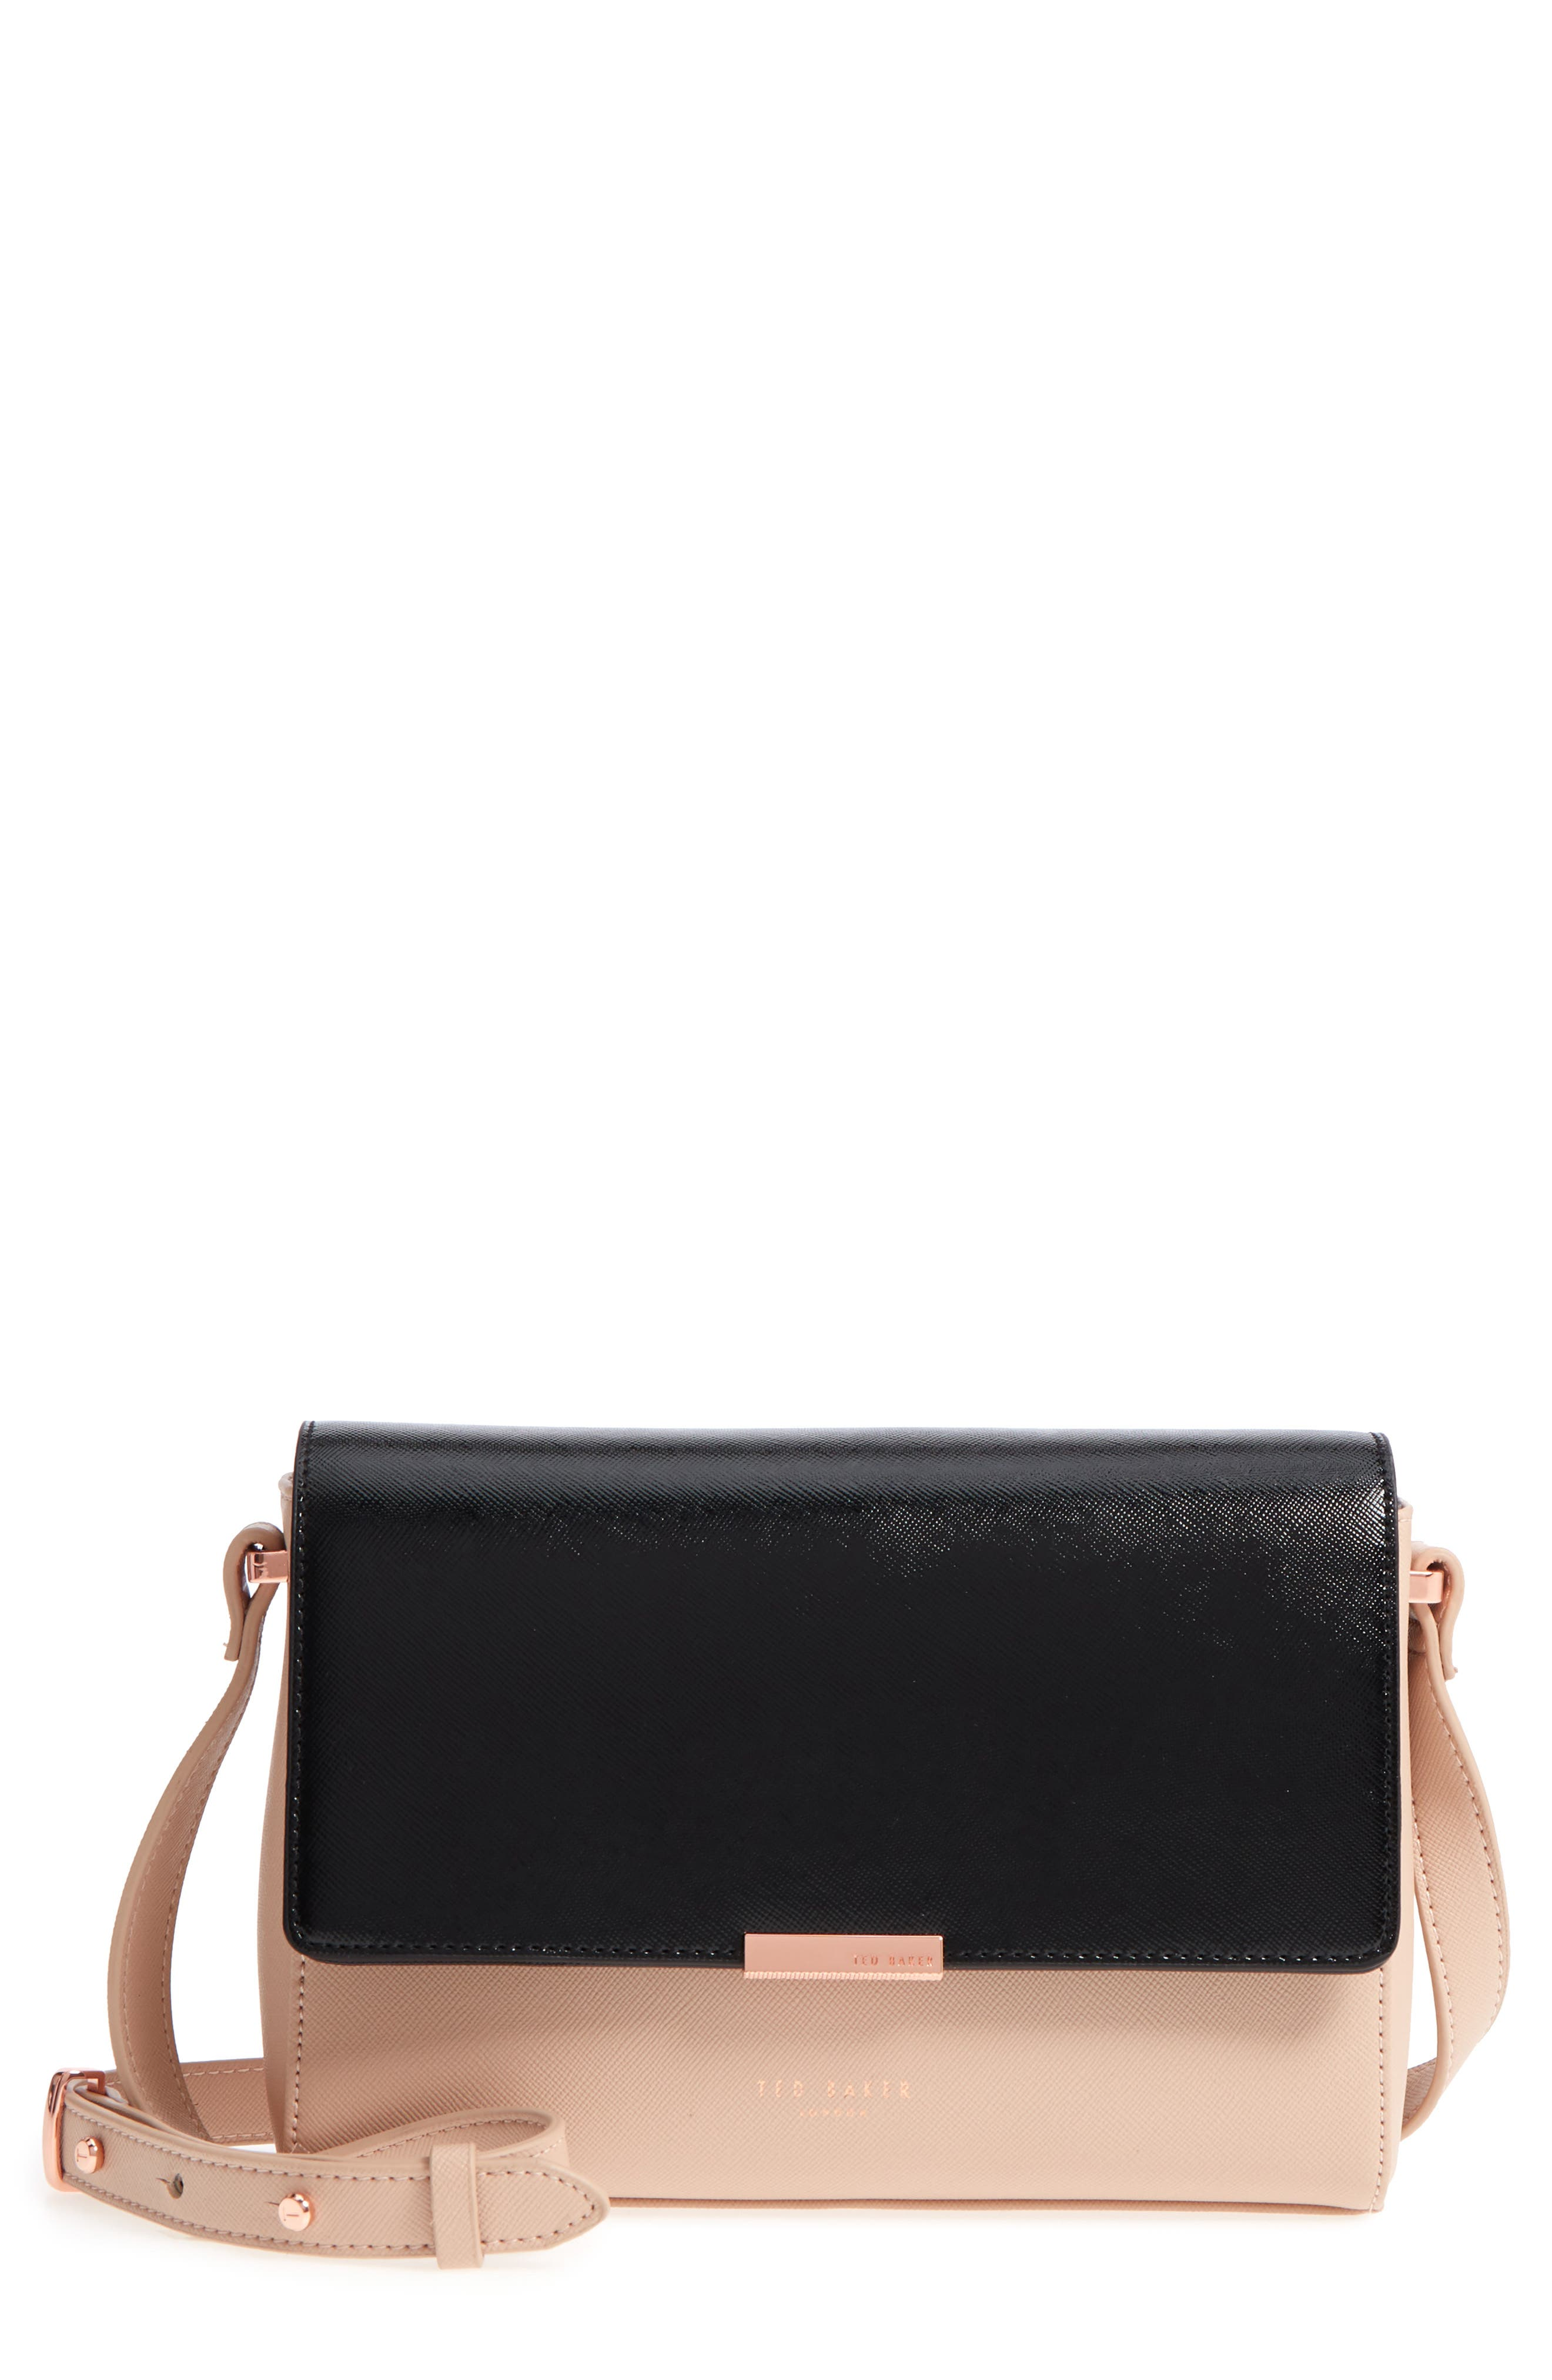 Demonda Faux Leather Crossbody Bag,                         Main,                         color, Taupe